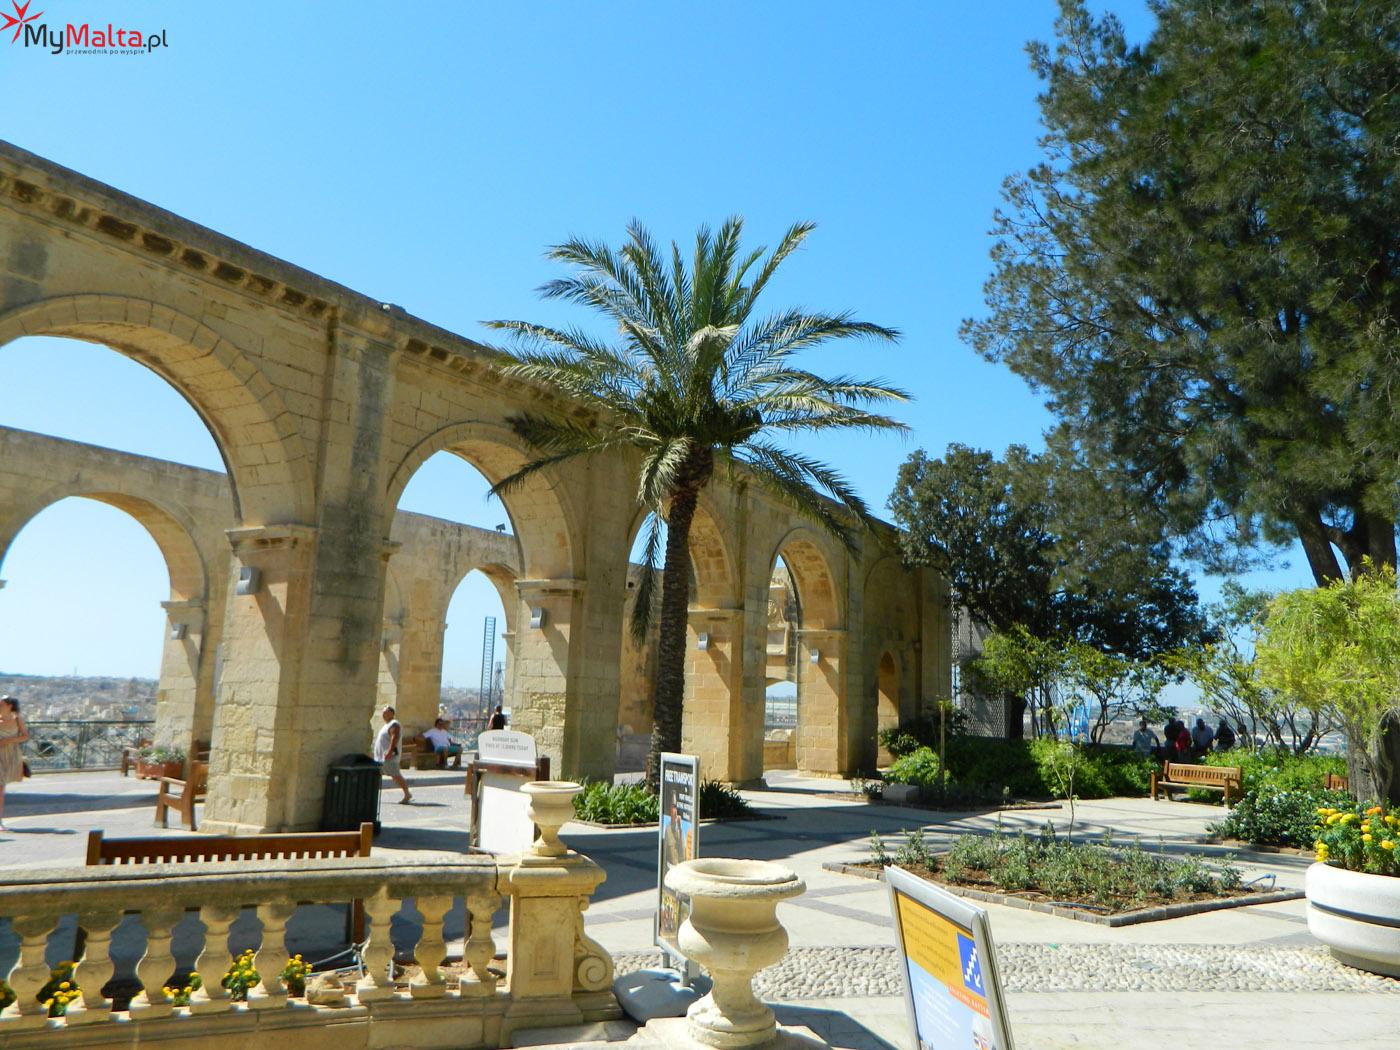 Ogrody Barrakka - Valletta